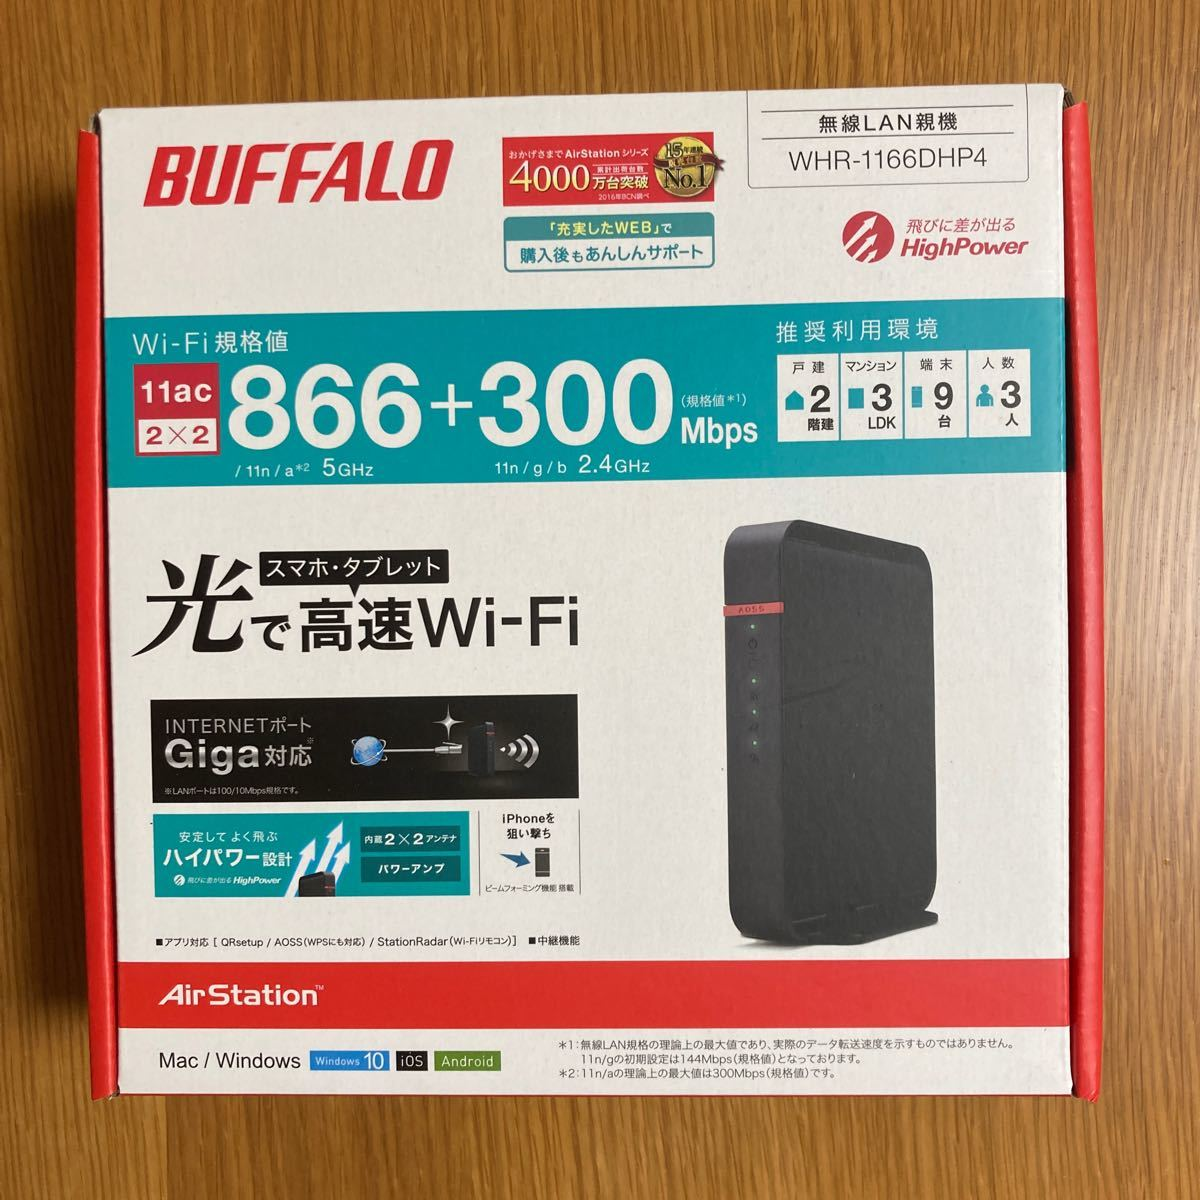 BUFFALO WHR-1166DHP4 無線LANルーター GIGA WiFi ルーター